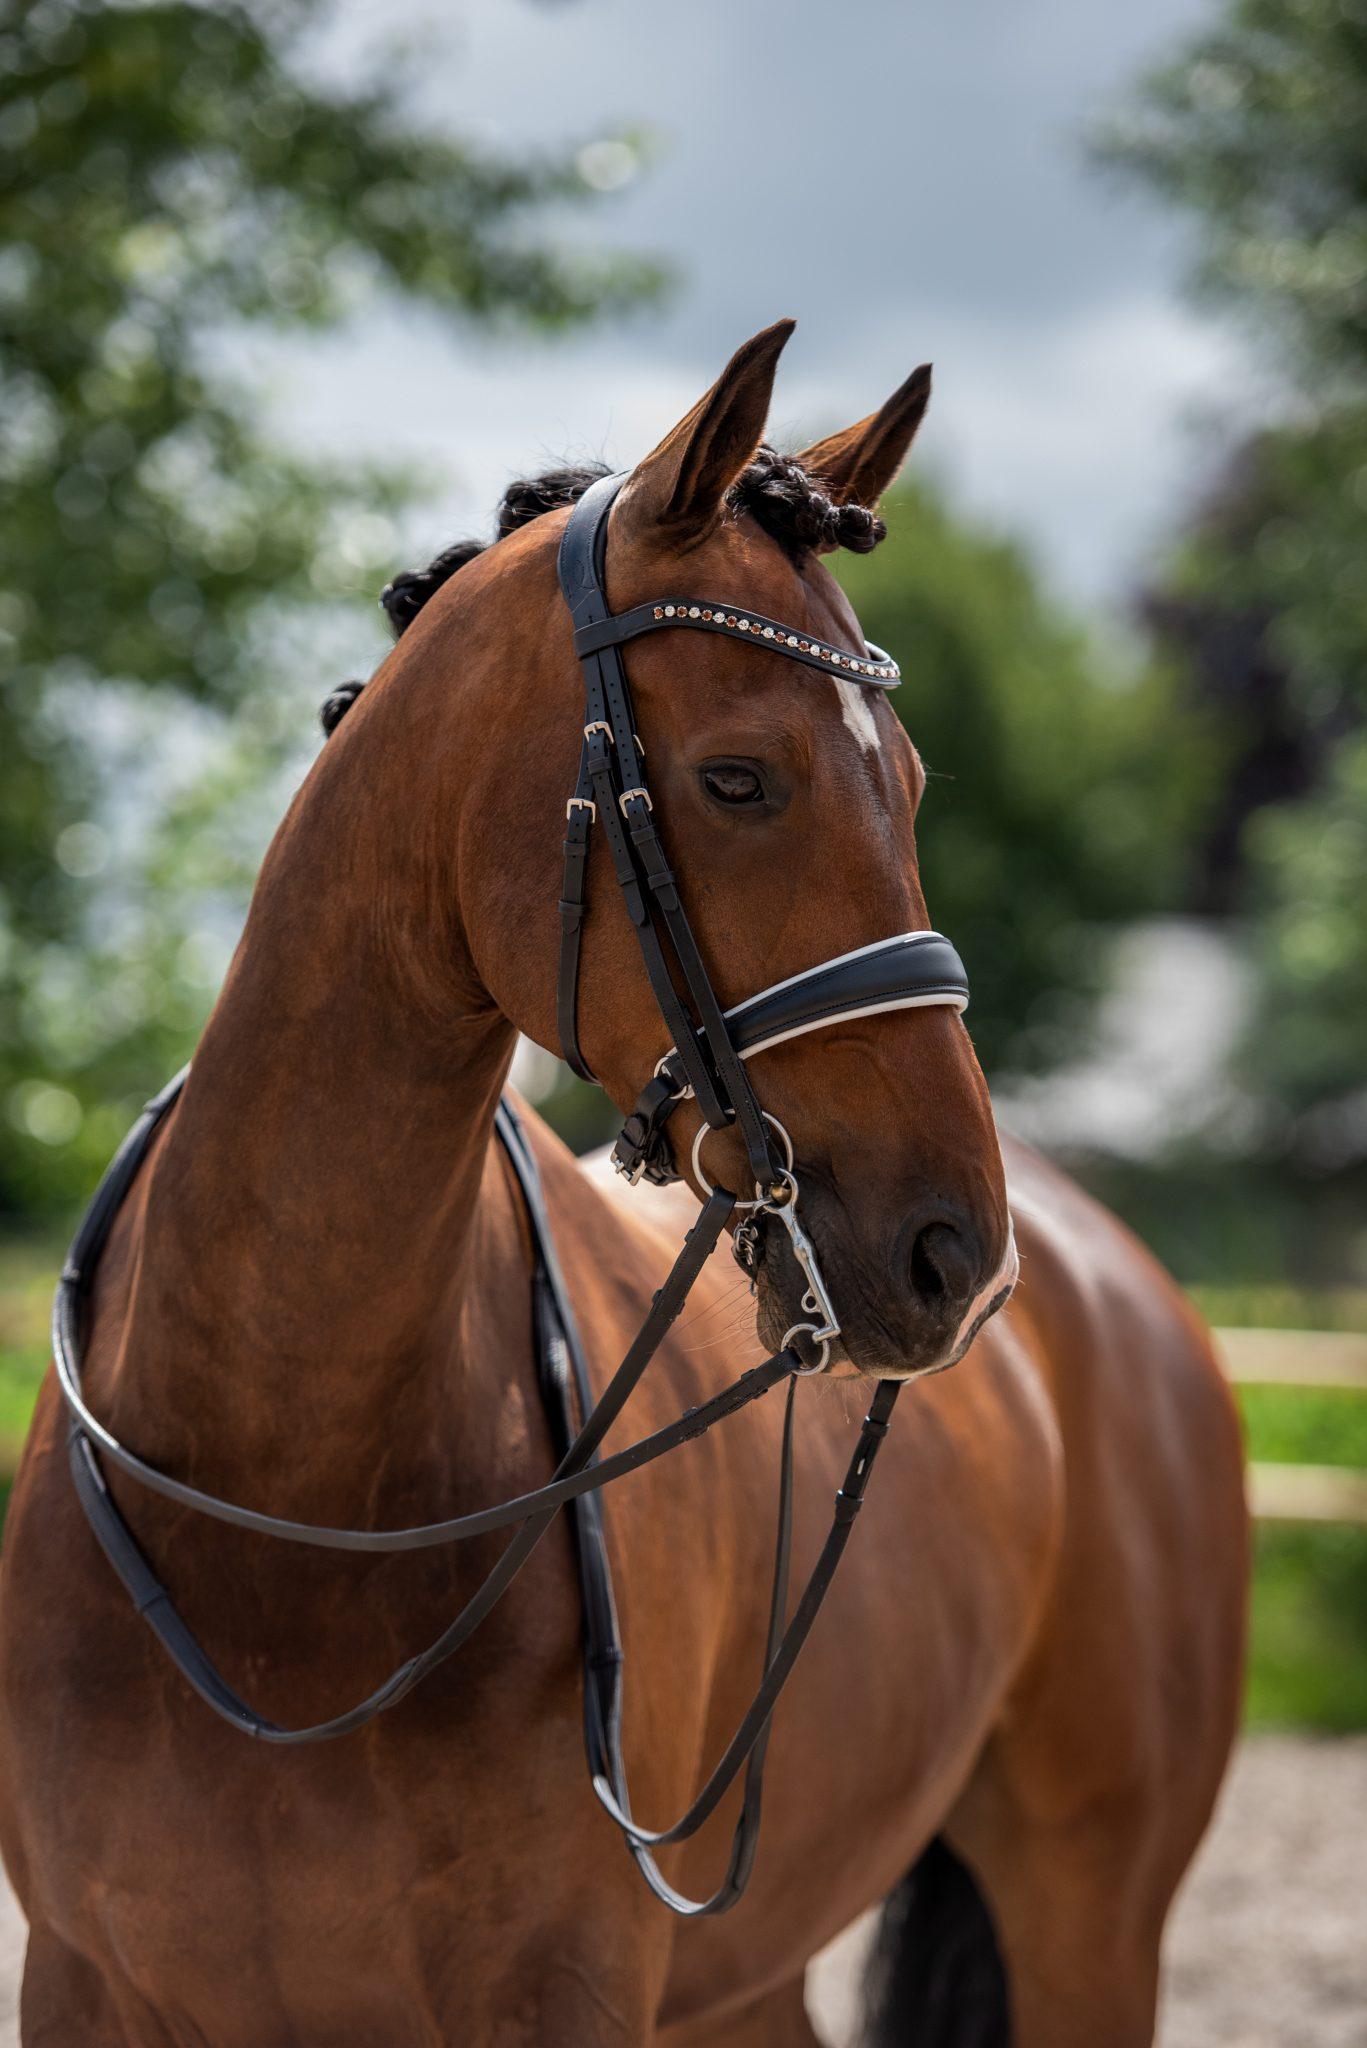 Compleet Bridle2fit hoofdstel en leidsel op een paard